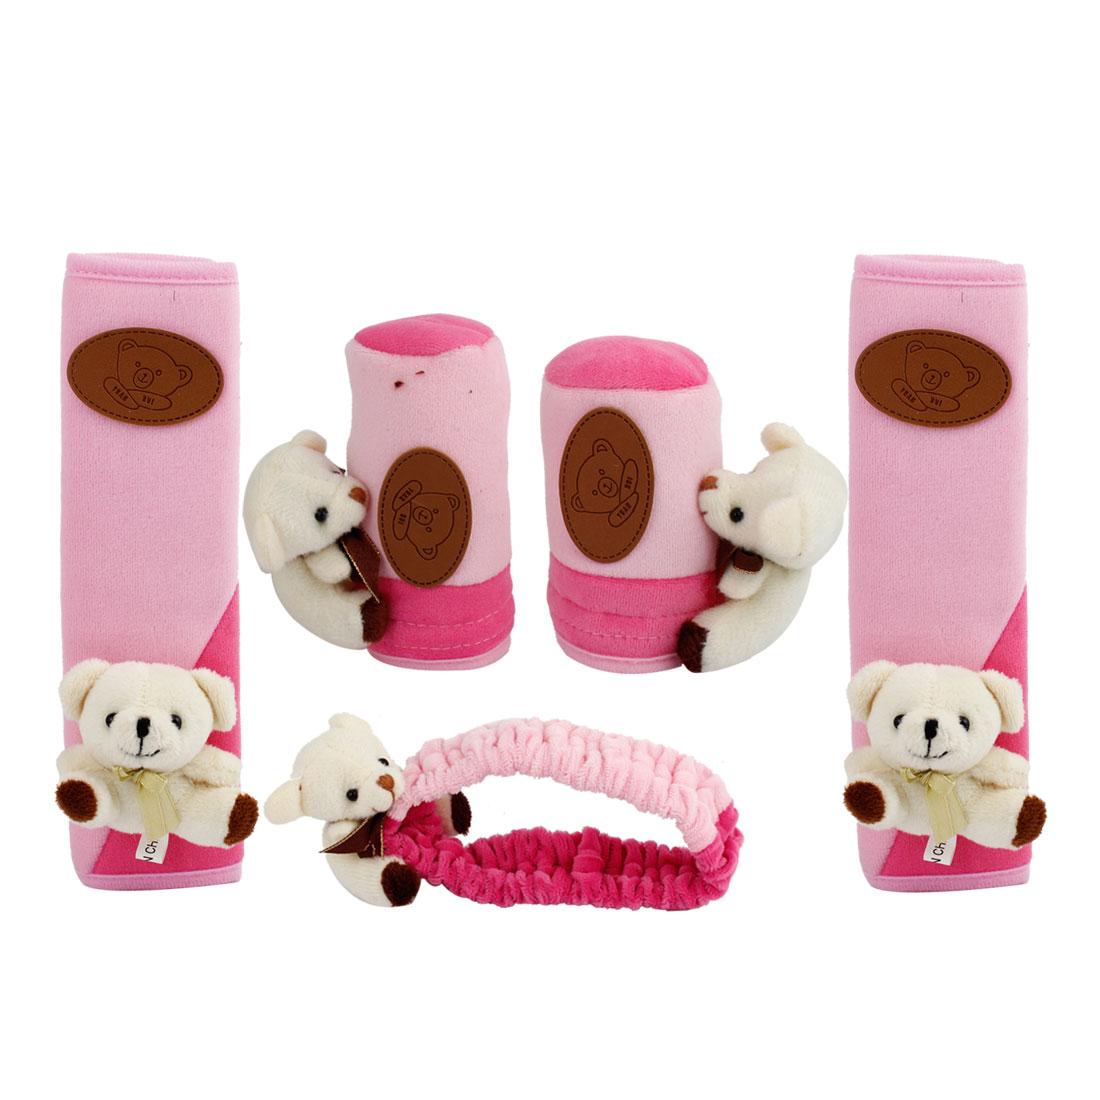 5 in 1 Bear Decor Pink Plush Gear Shift Knob Mirror Hand Brake Seatbelt Cover for Car